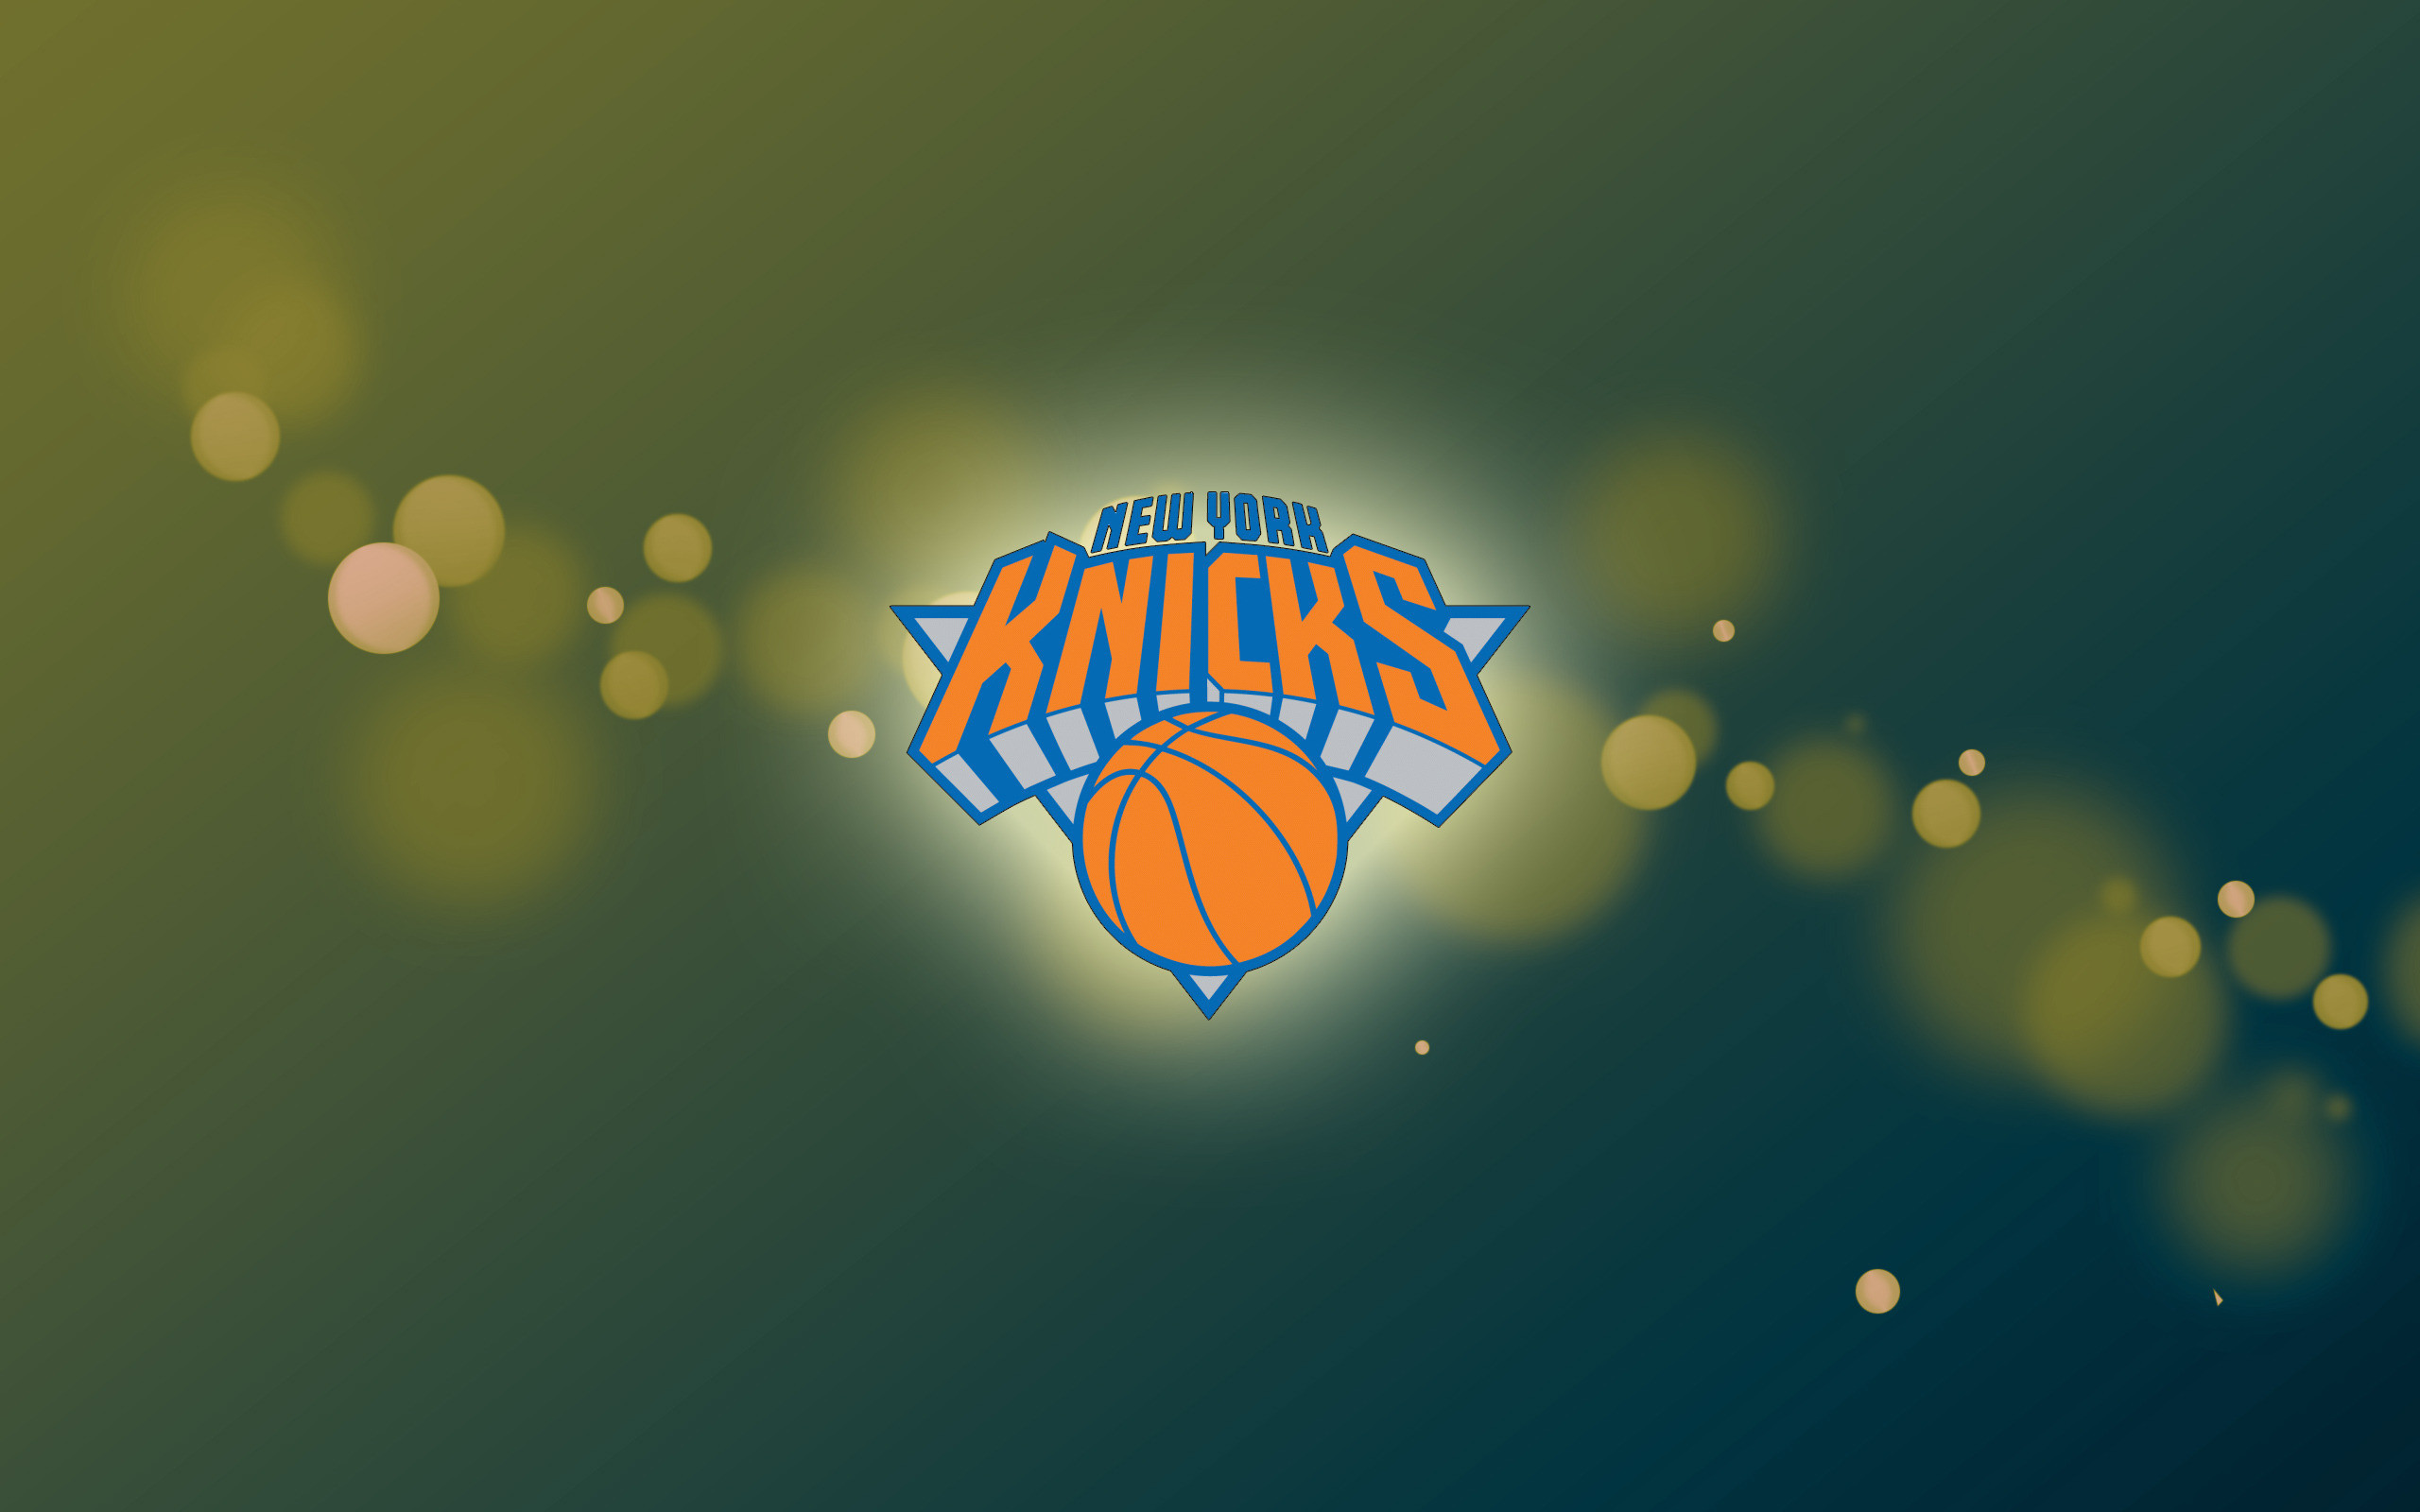 New-York-Knicks-Logo-Background-HD